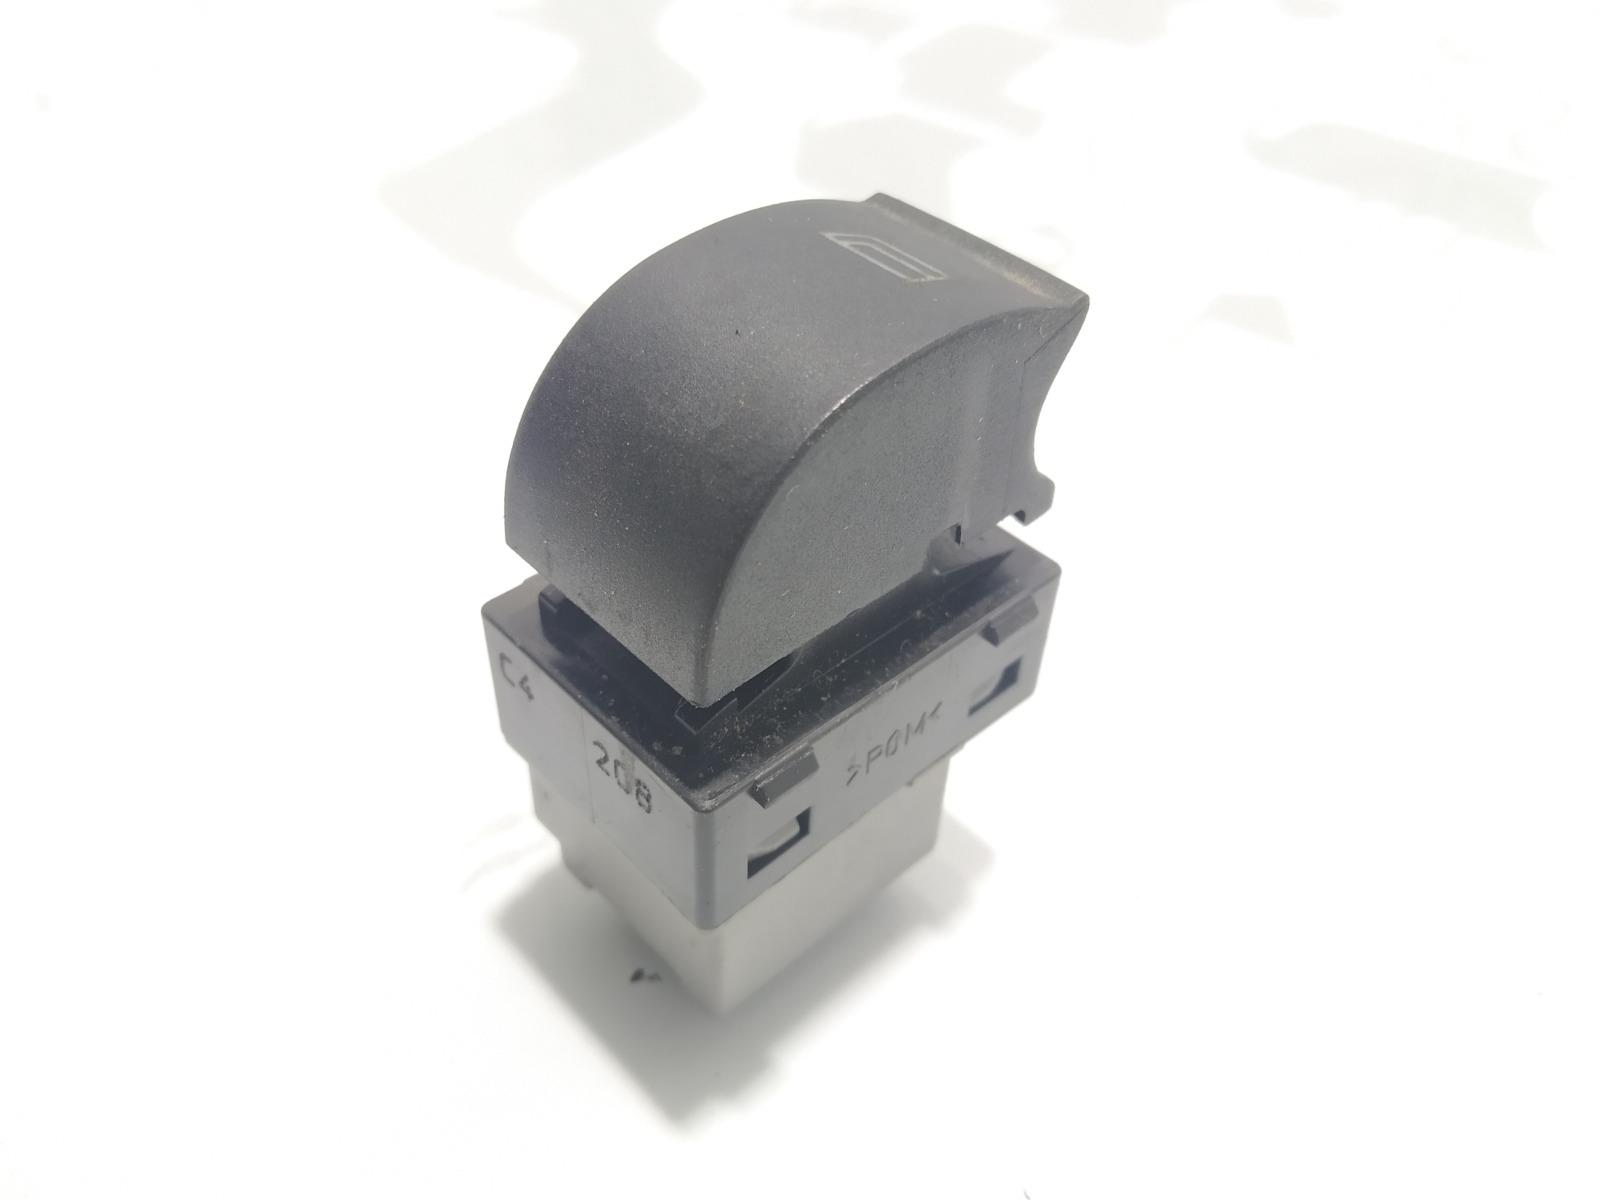 Кнопка стеклоподъемника Audi A6 C5 1.8 TI 1998 (б/у)